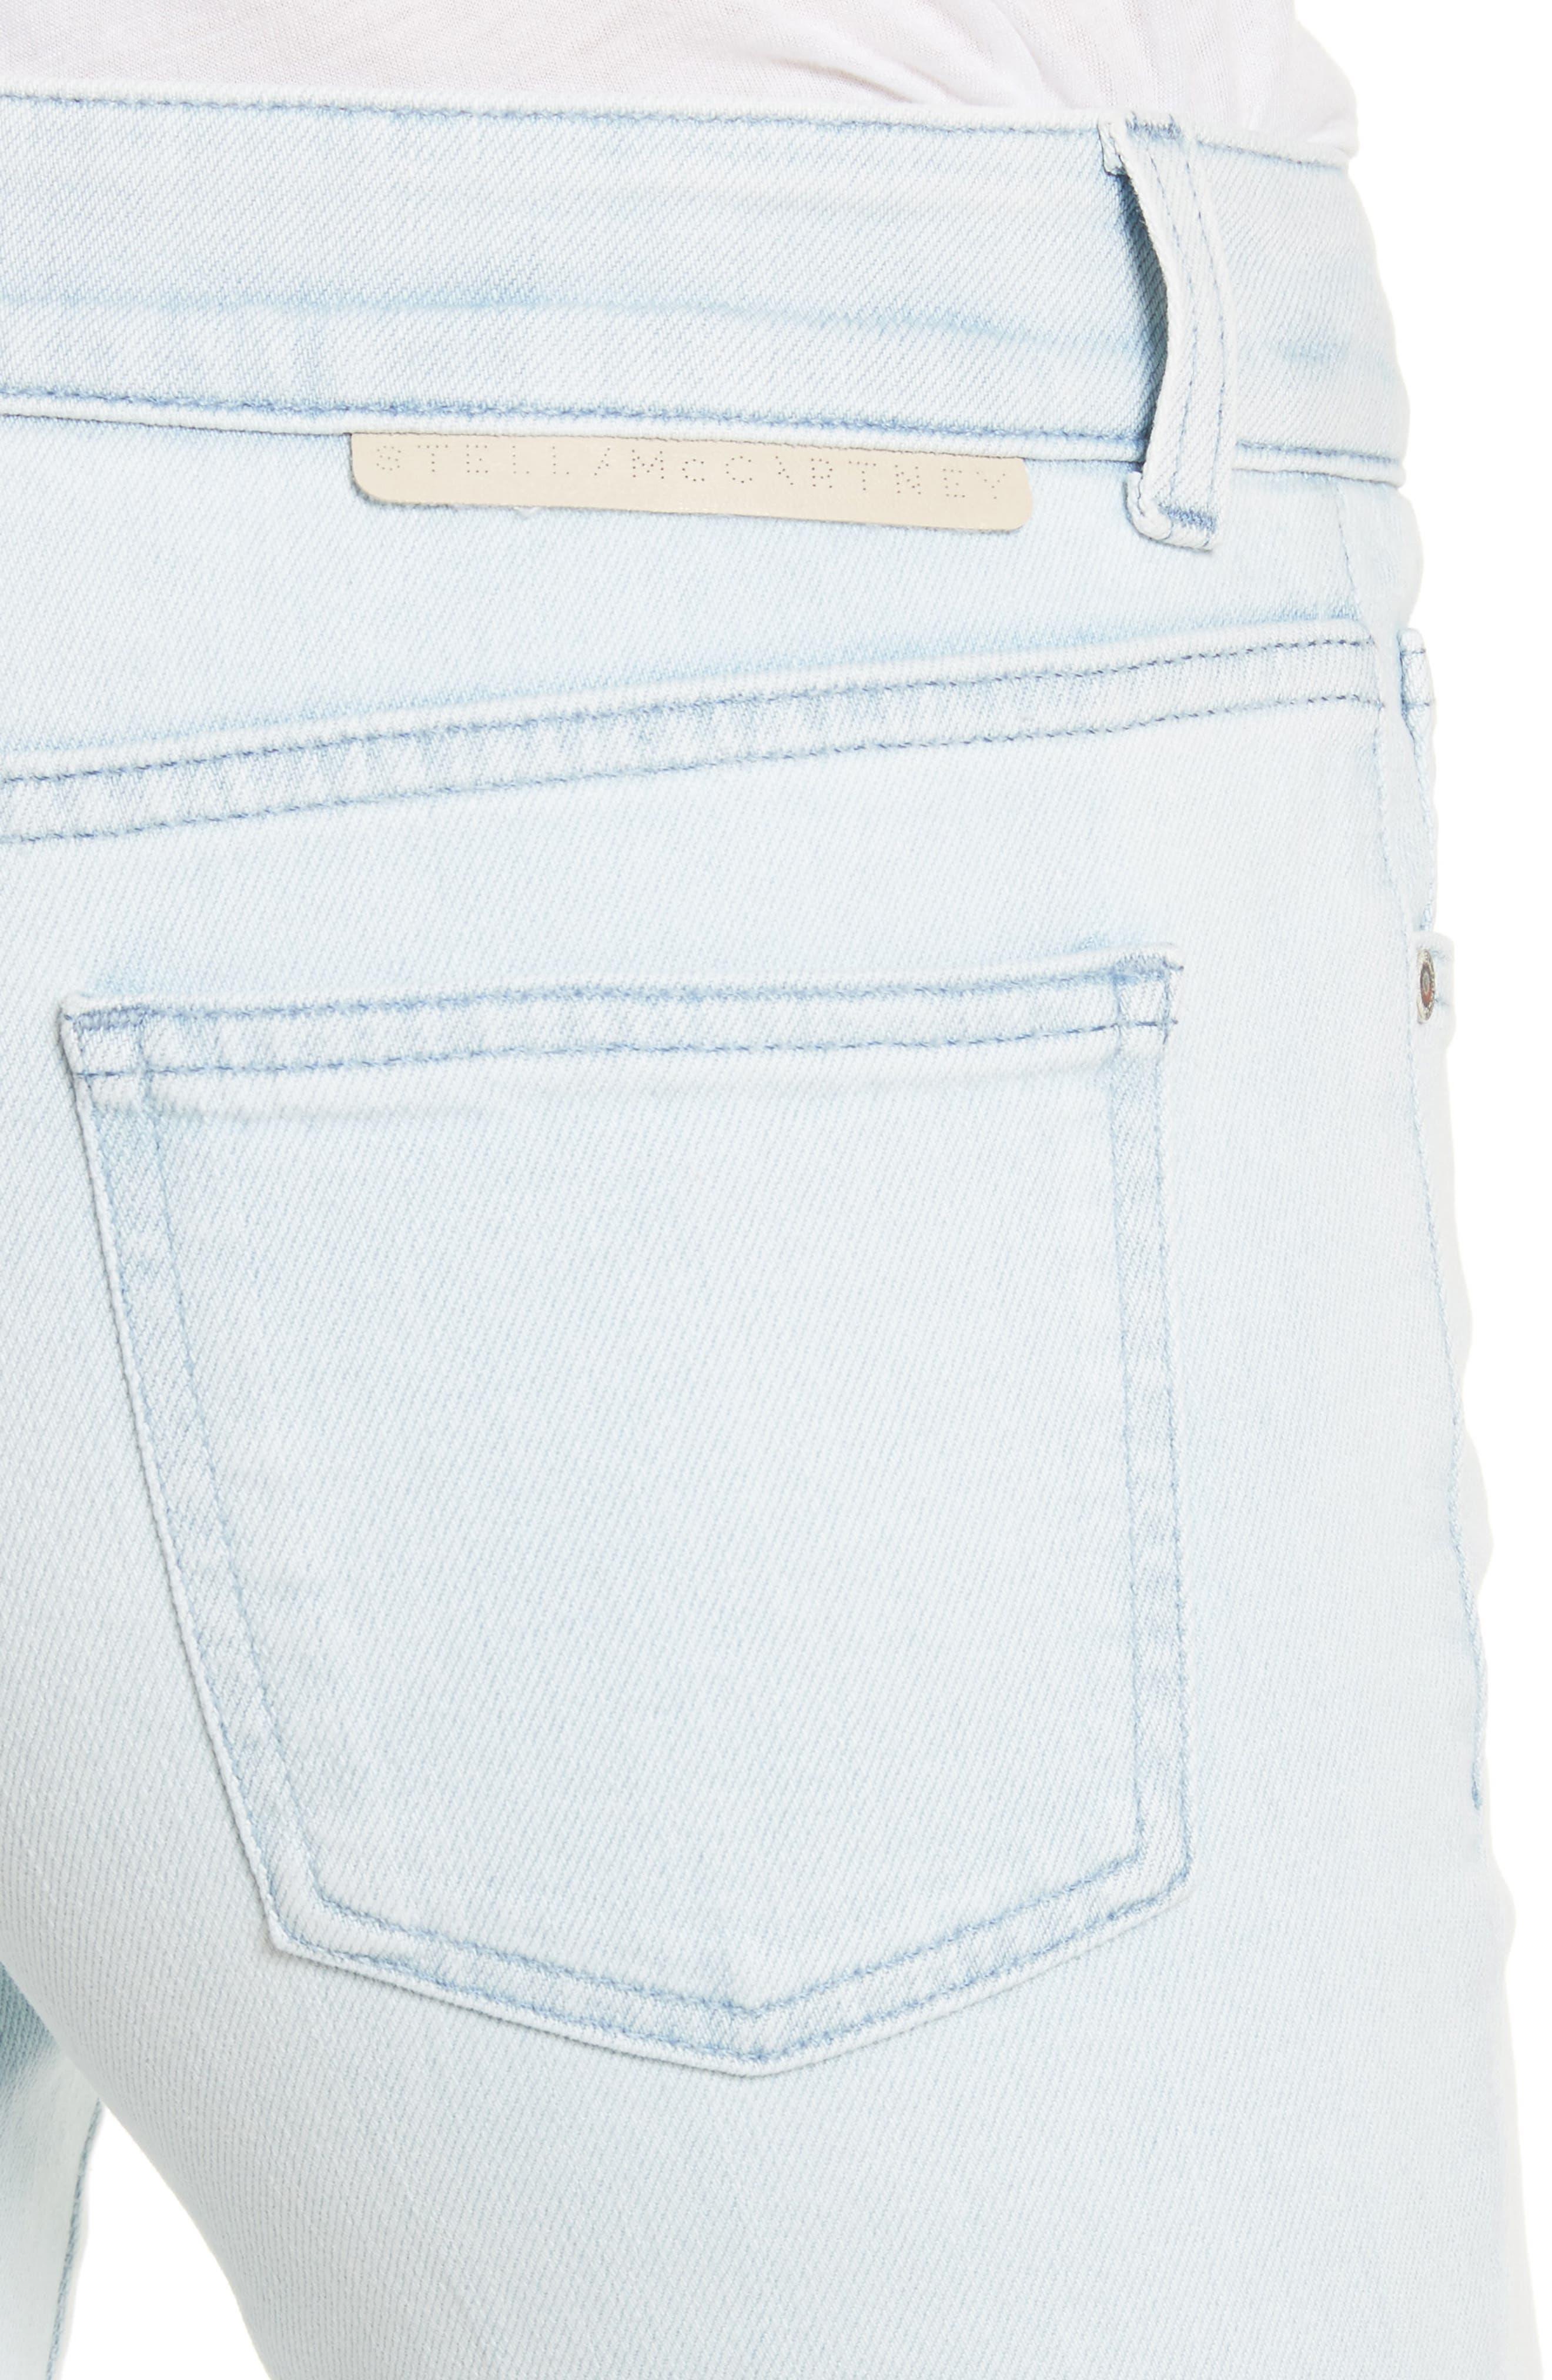 Metallic Star Kick Flare Jeans,                             Alternate thumbnail 4, color,                             Sun Faded Blue